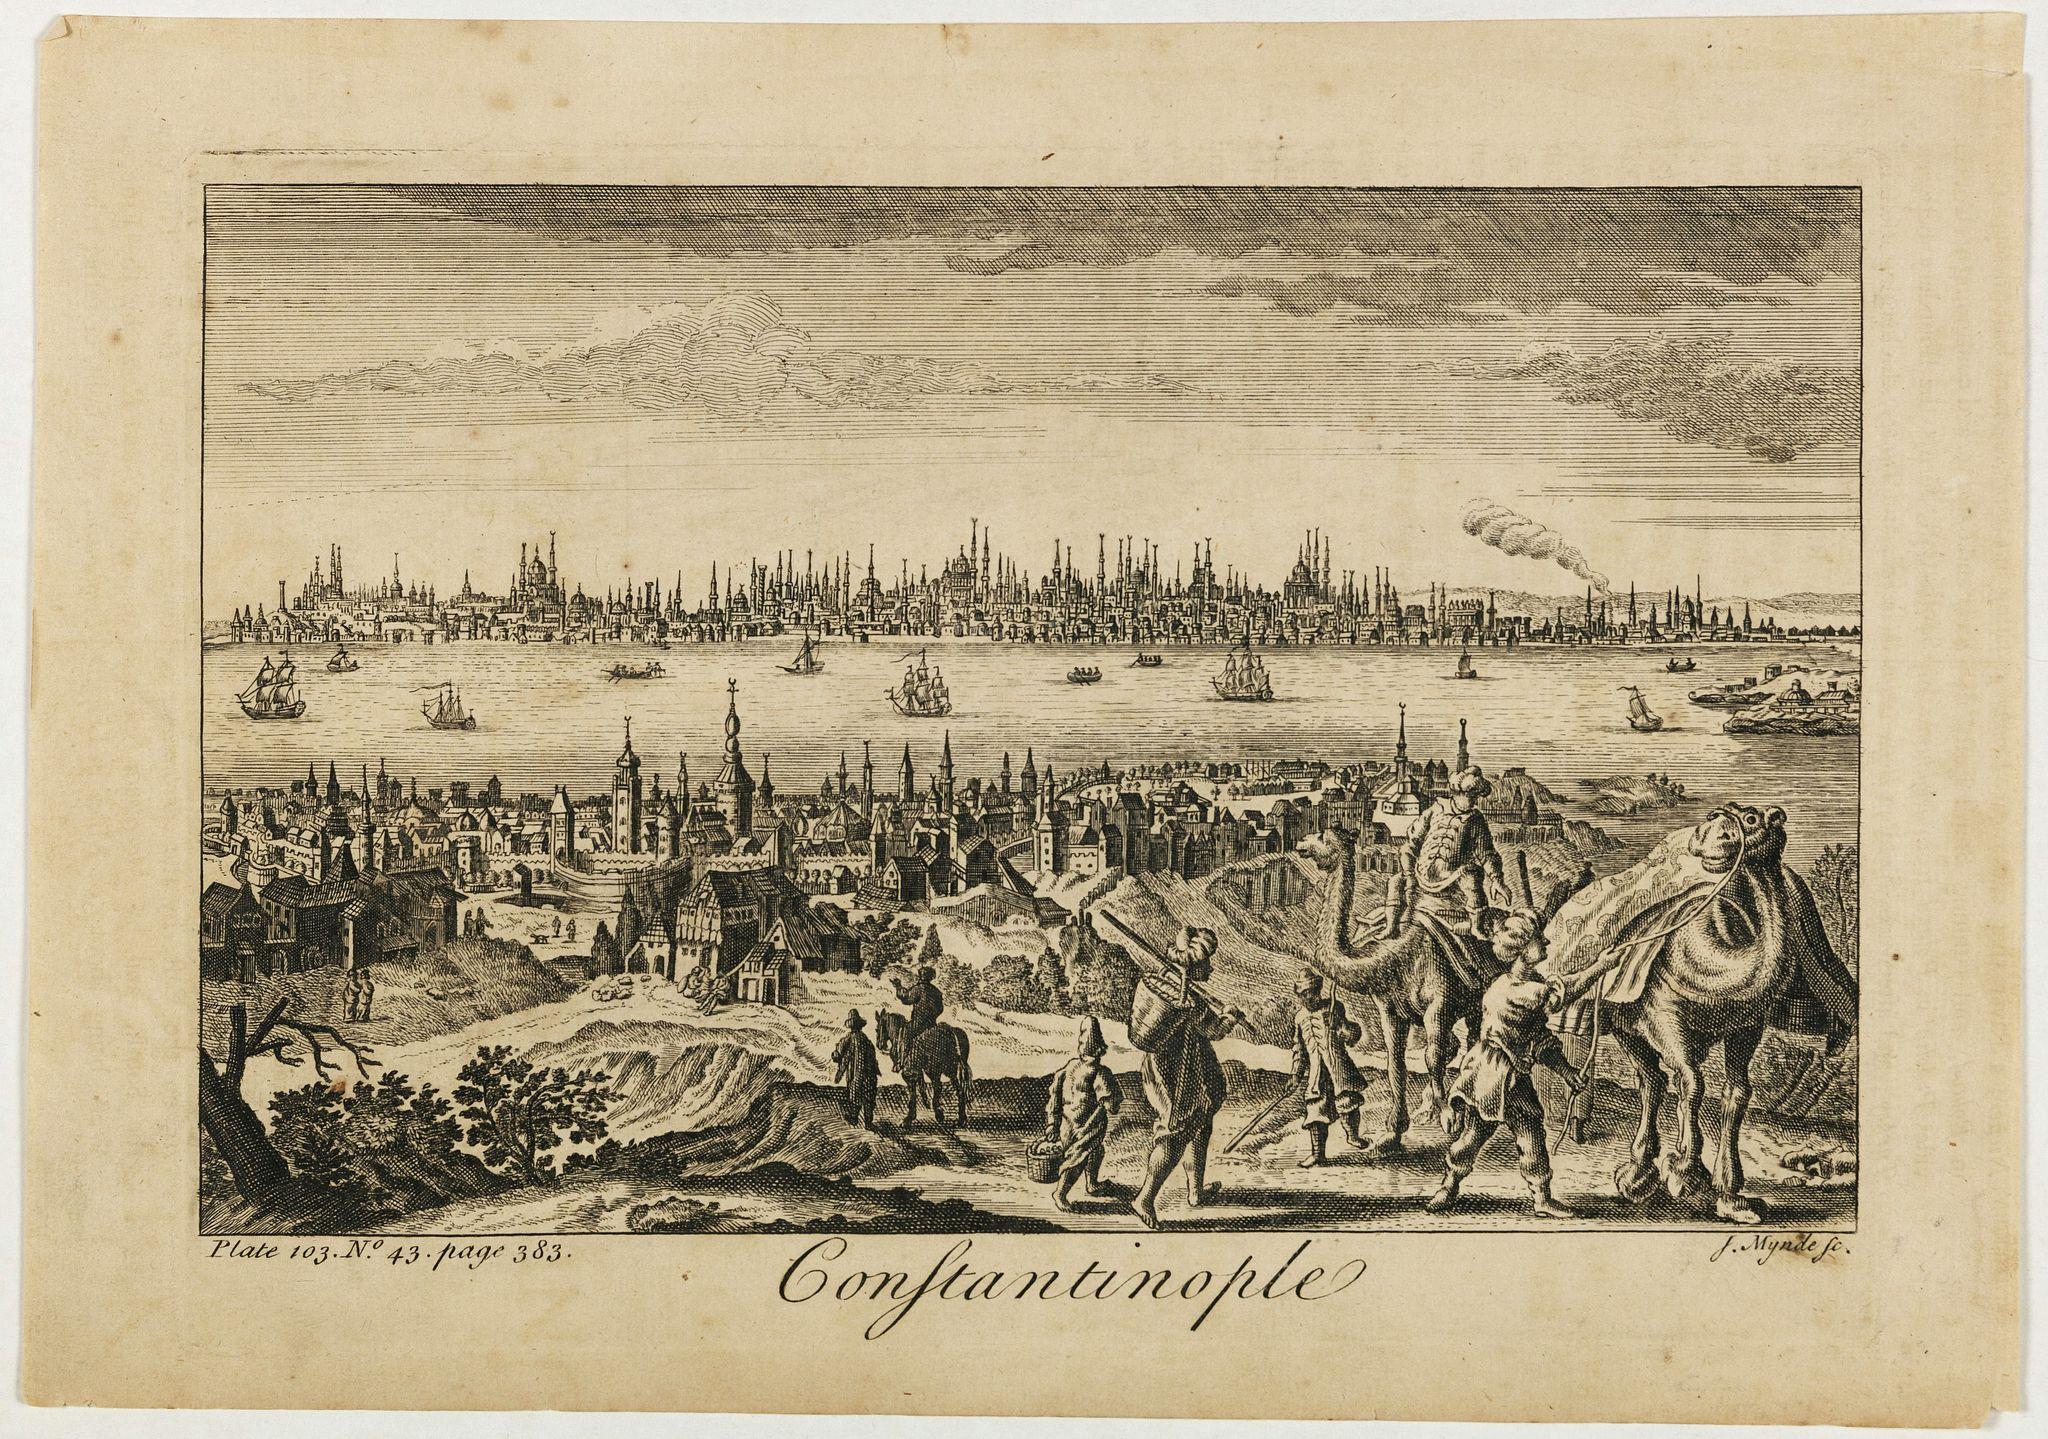 MYNDE, J. -  Constantinople.